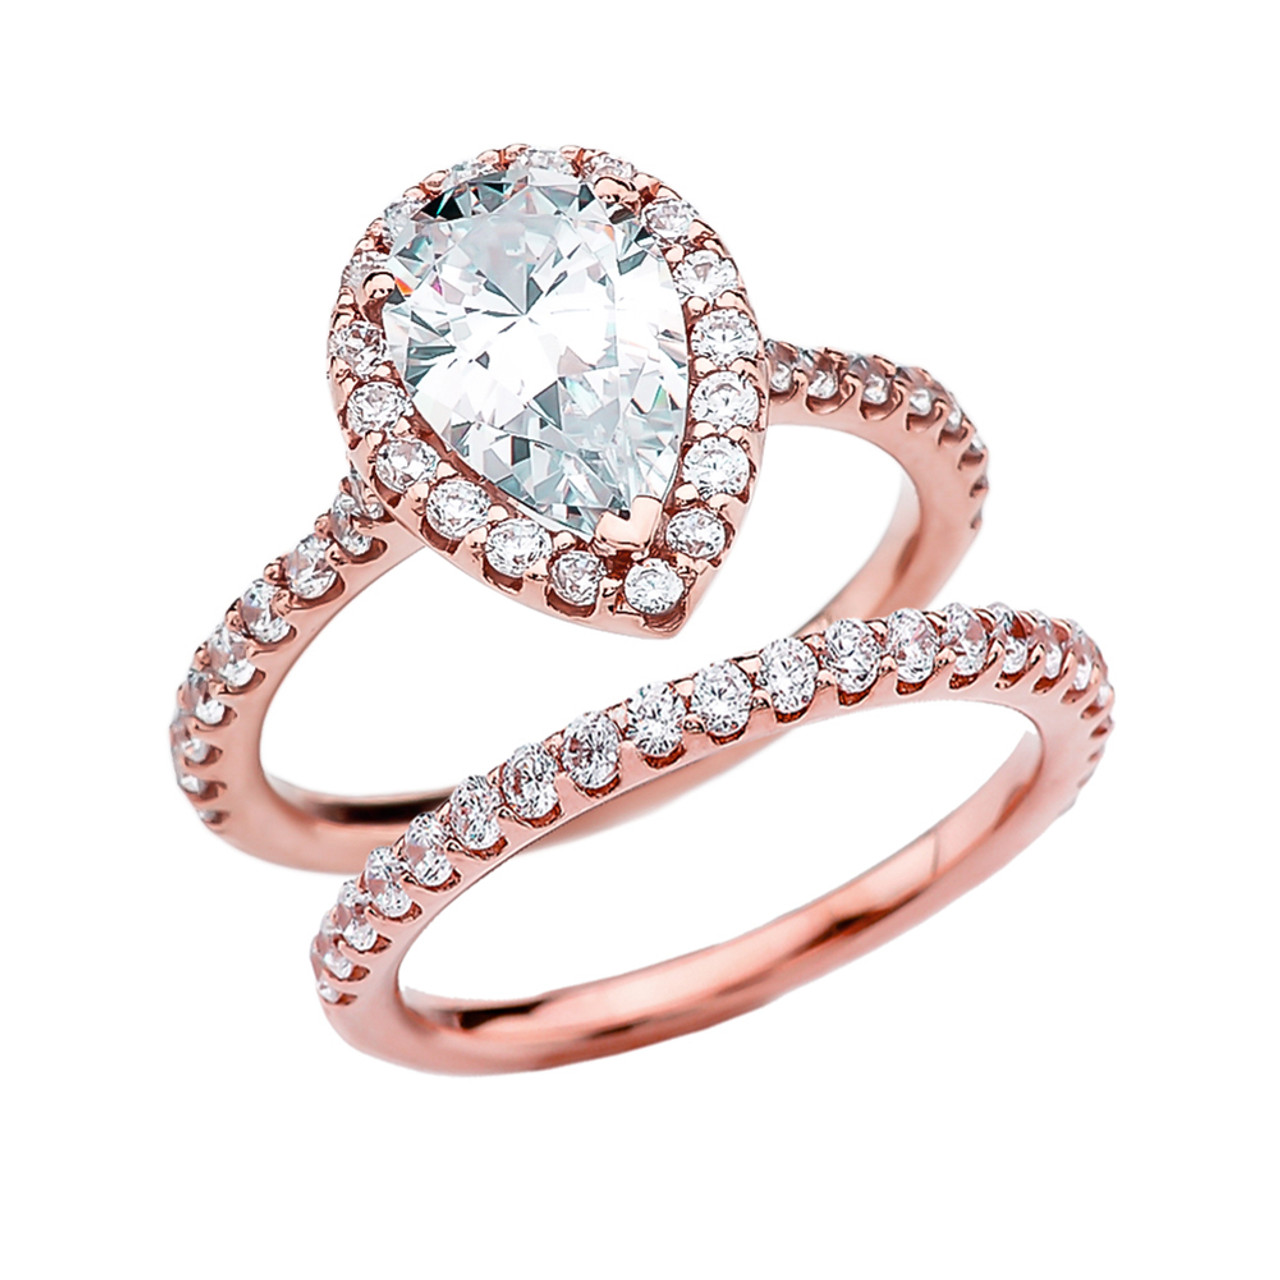 Pear Shape Solitaire Elegant Rose Gold Cubic Zirconia Engagement Wedding Ring Set